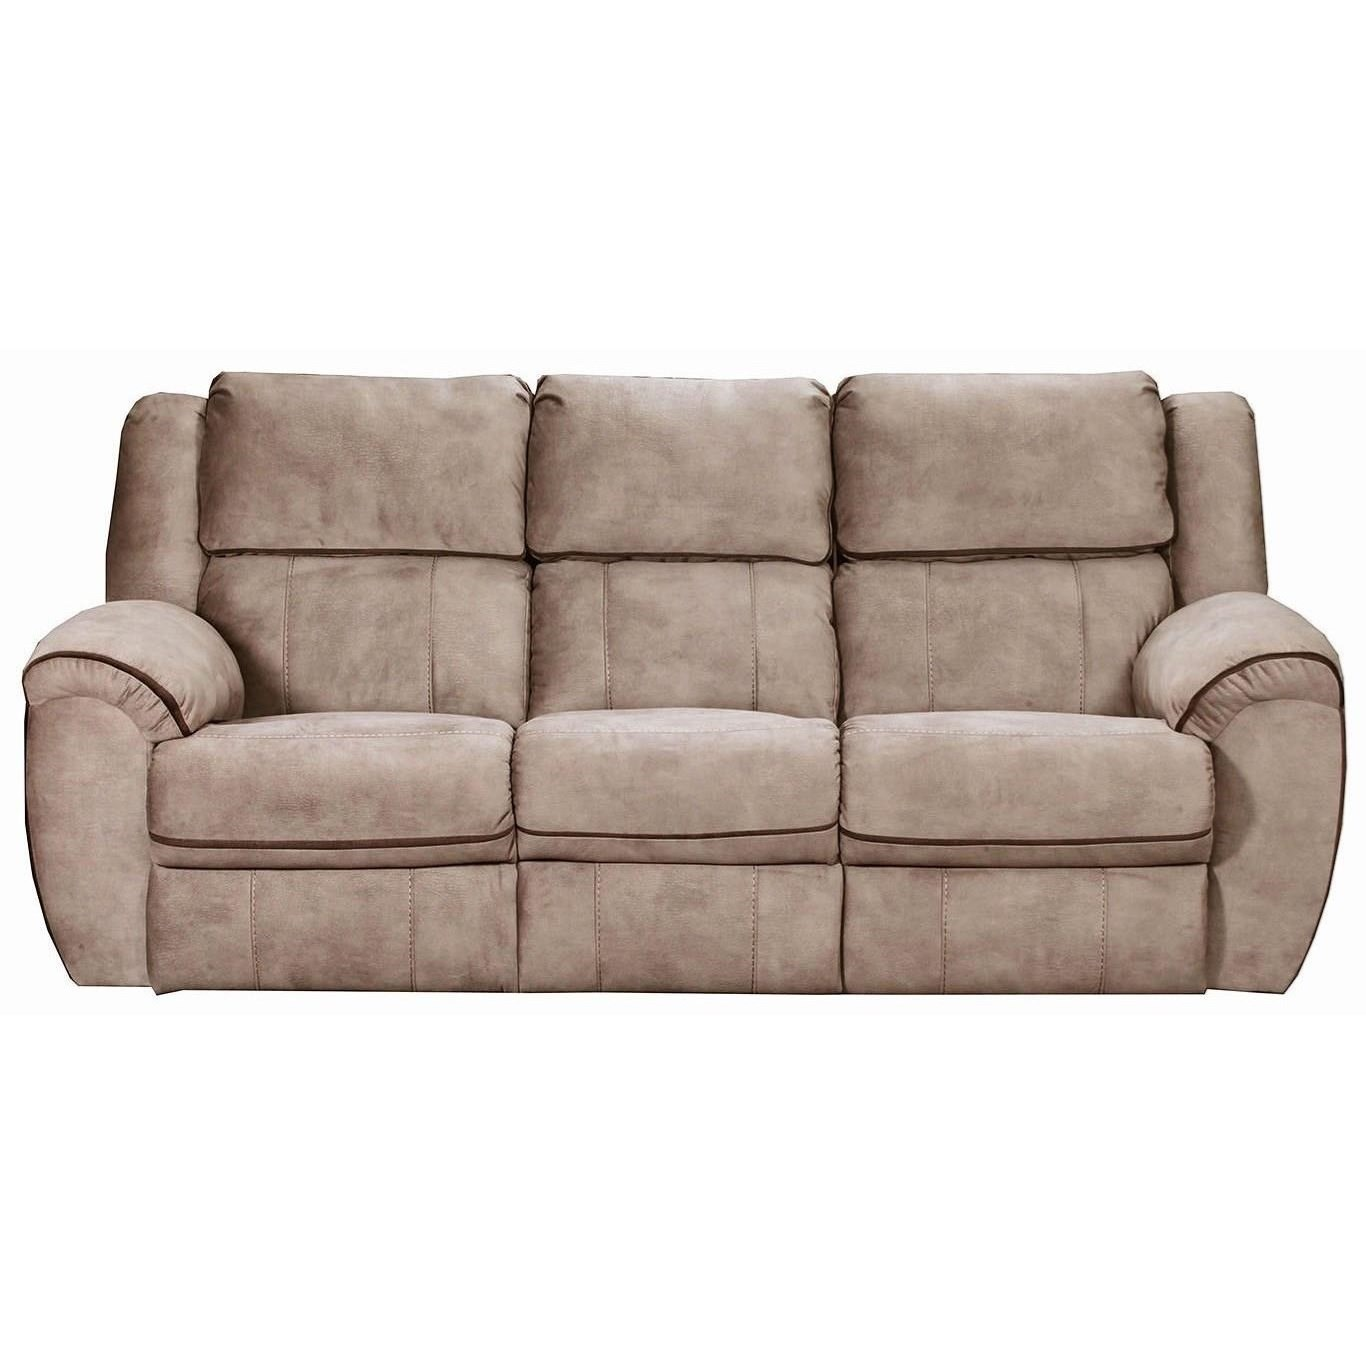 50436BR Power Reclining Sofa by United Furniture Industries at Bullard Furniture